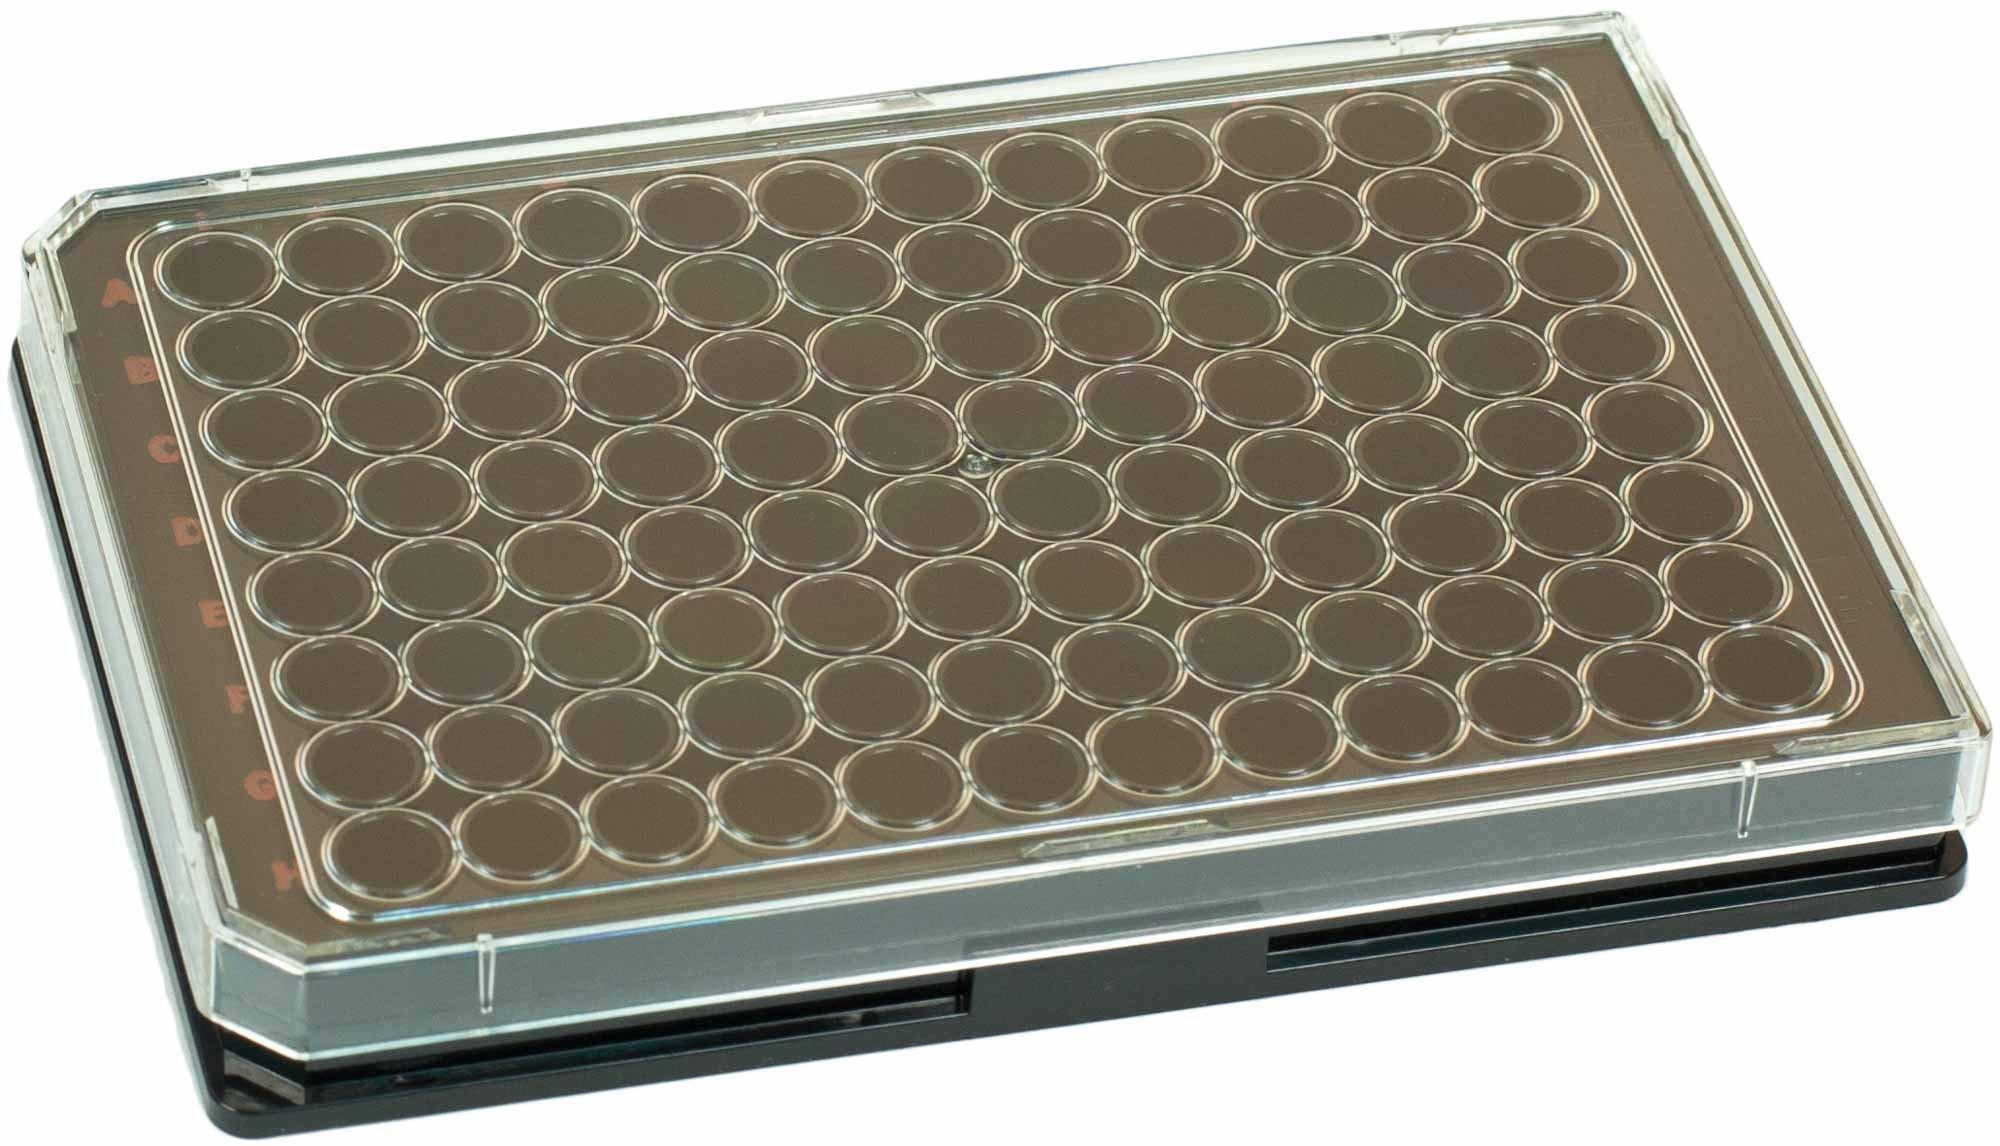 BRANDplates cellGrade Treated Sterile Surface 96-Well Plate - Black, F-Bottom